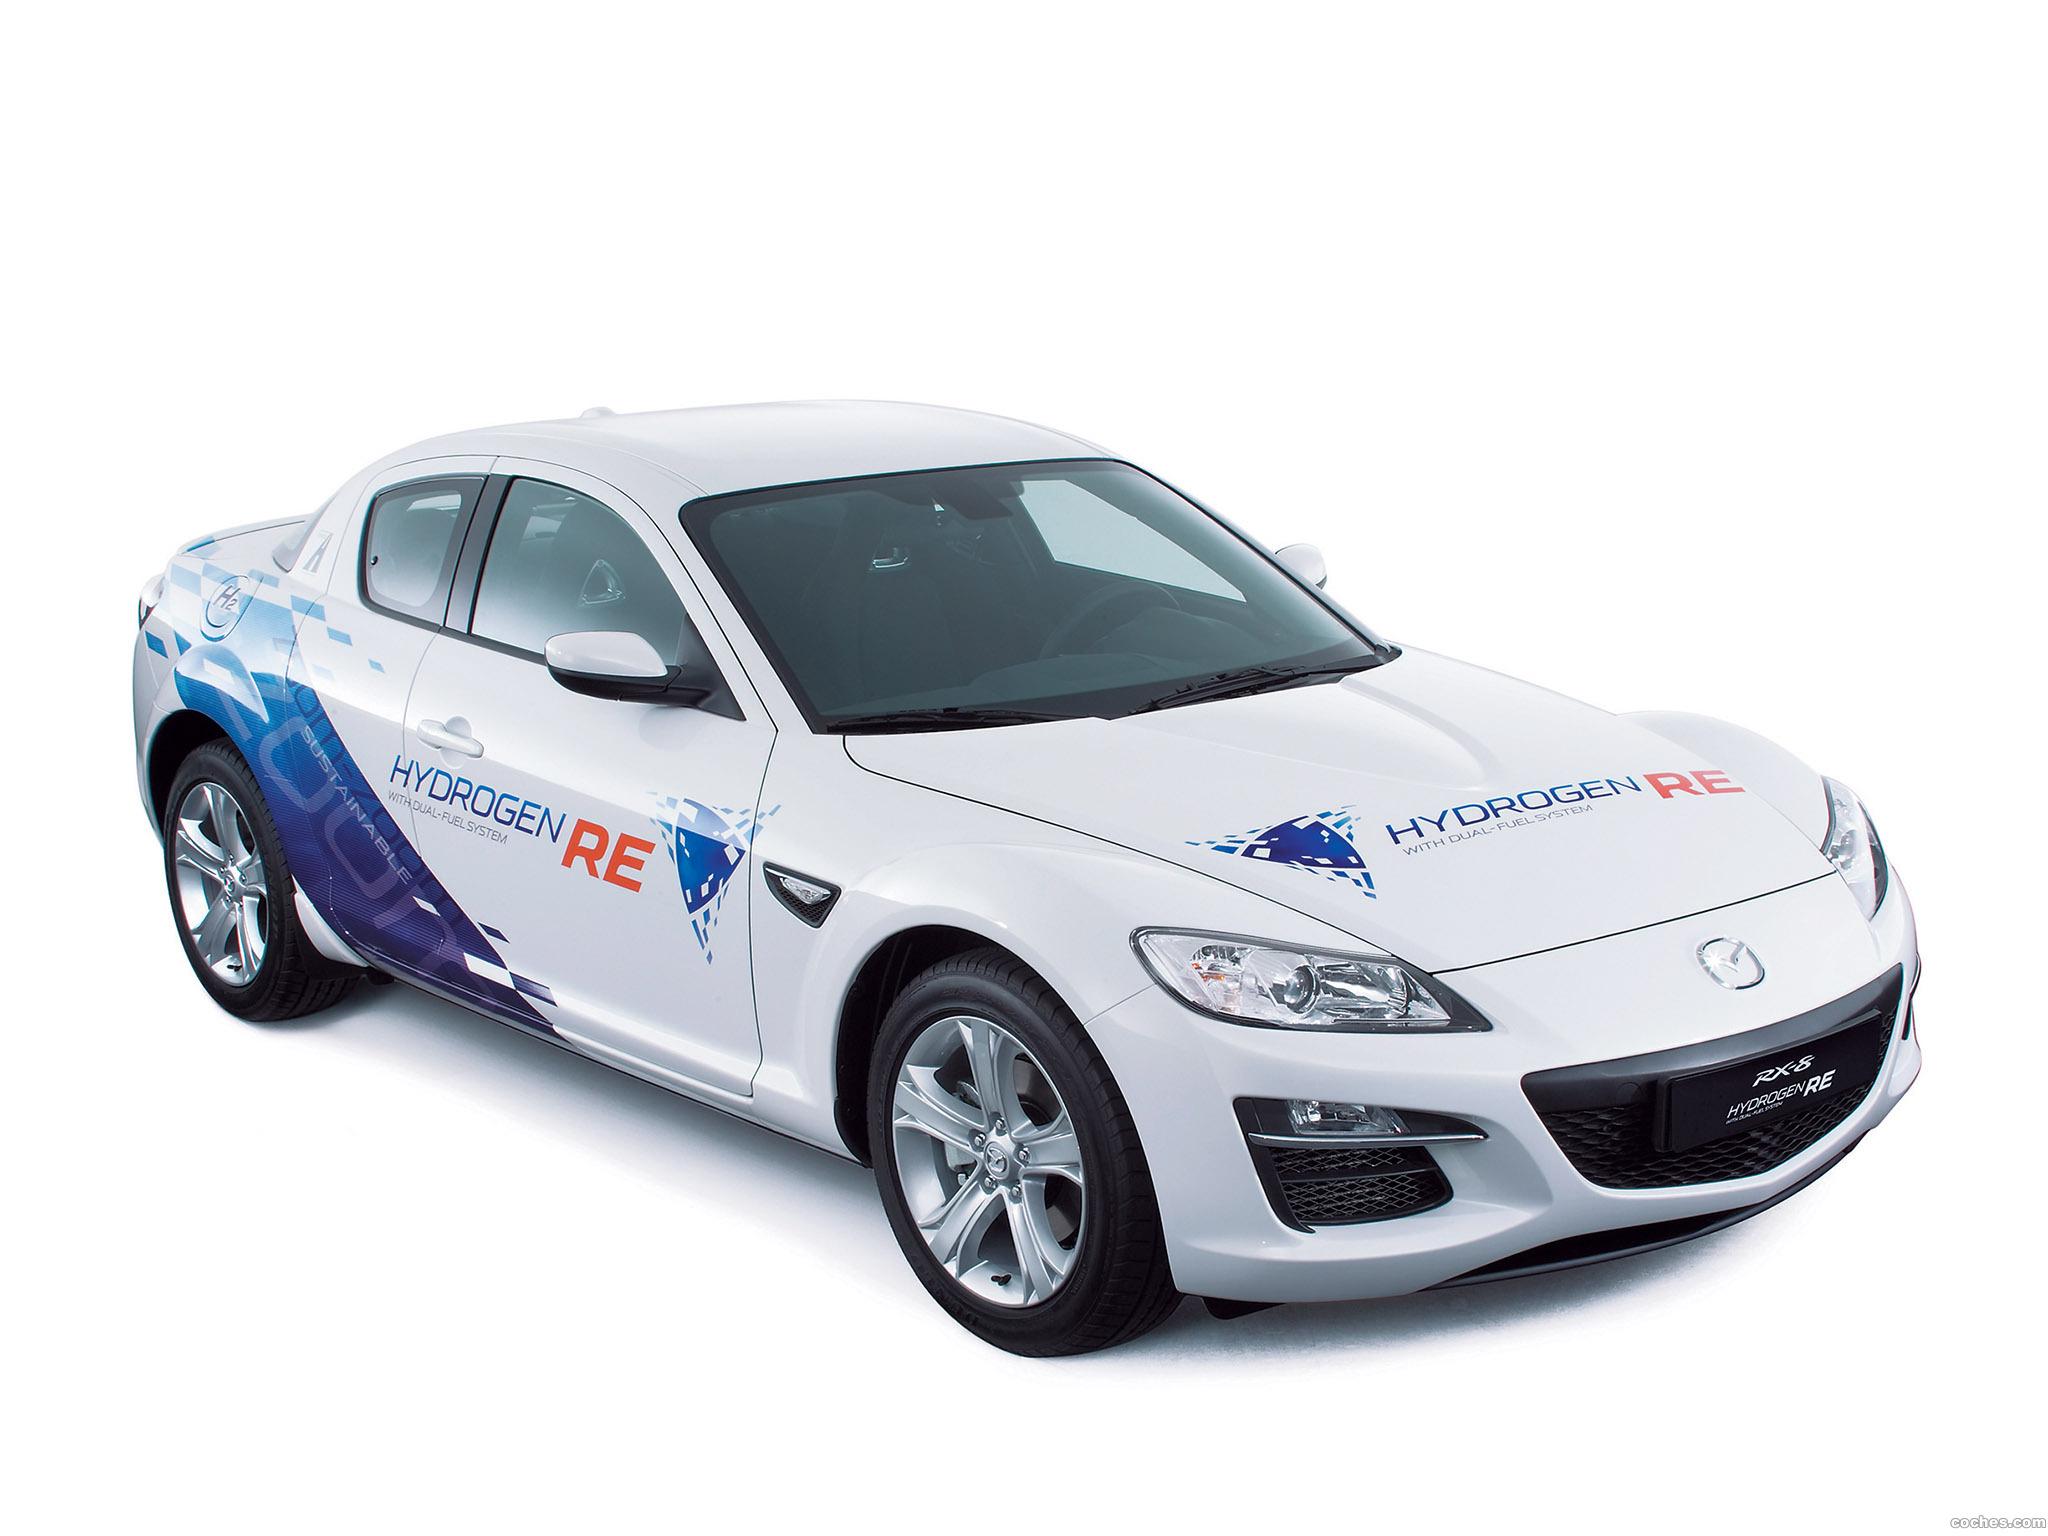 Foto 3 de Mazda RX-8 Hydrogen Re Dual Fuel System 2009